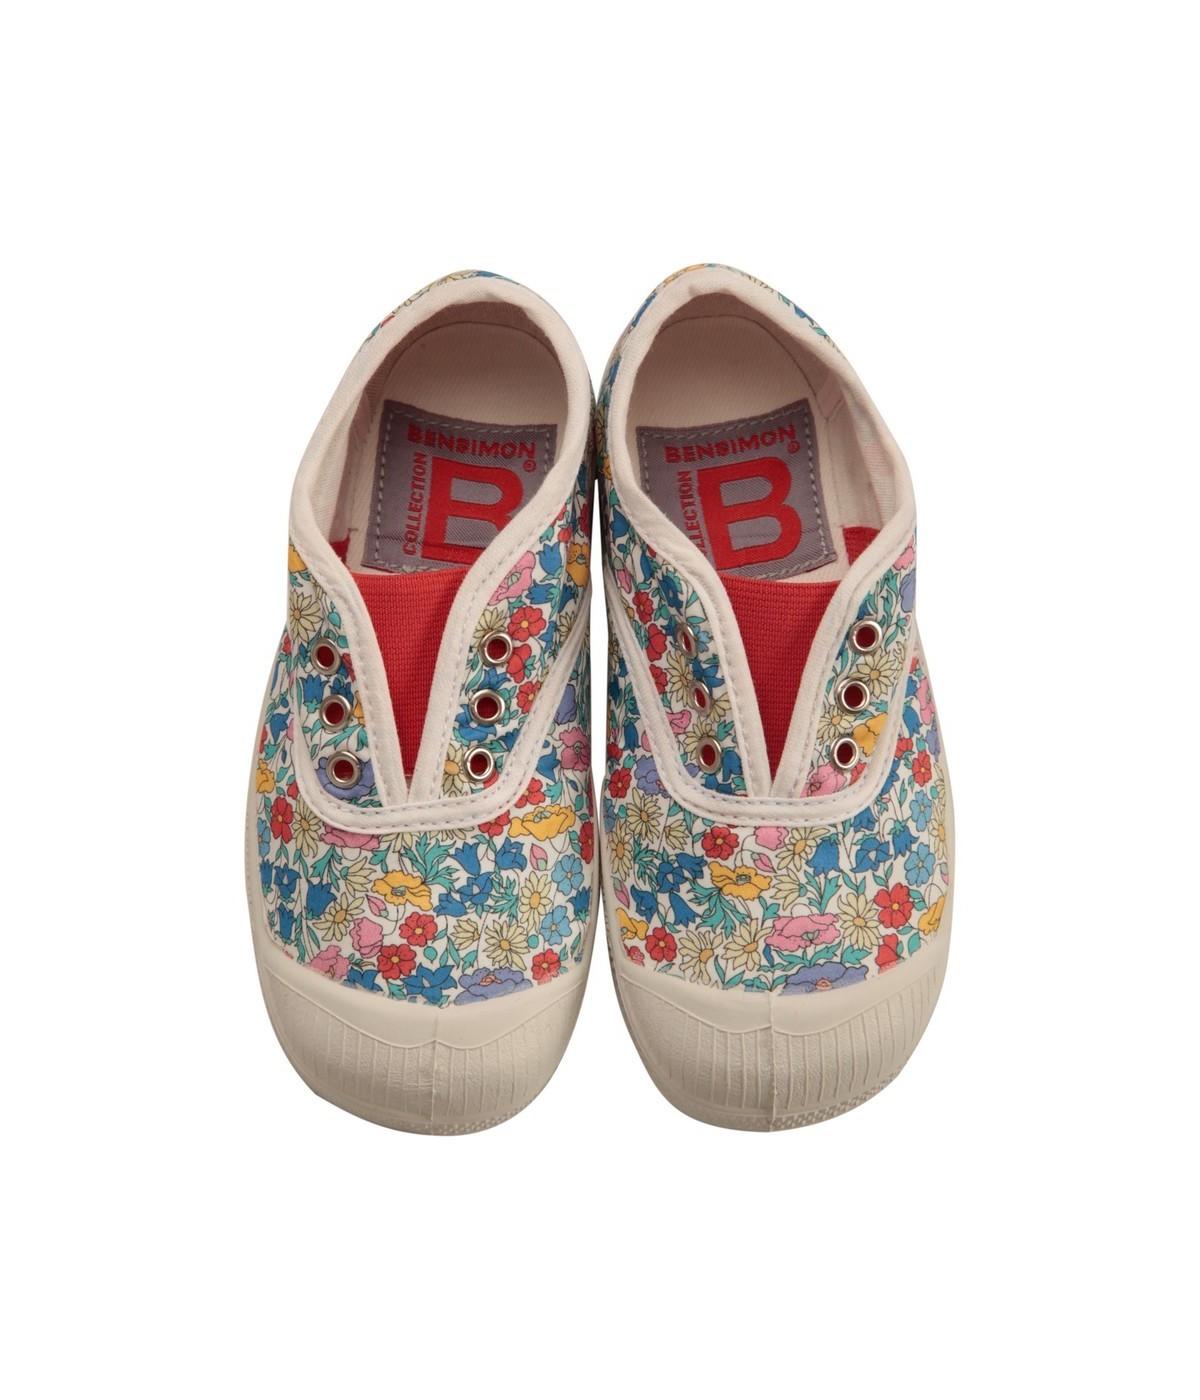 873ba8d675bff4 Basket Enfant Bensimon Tennis Elly Liberty Fleurs | SHOWROOMVIP ...